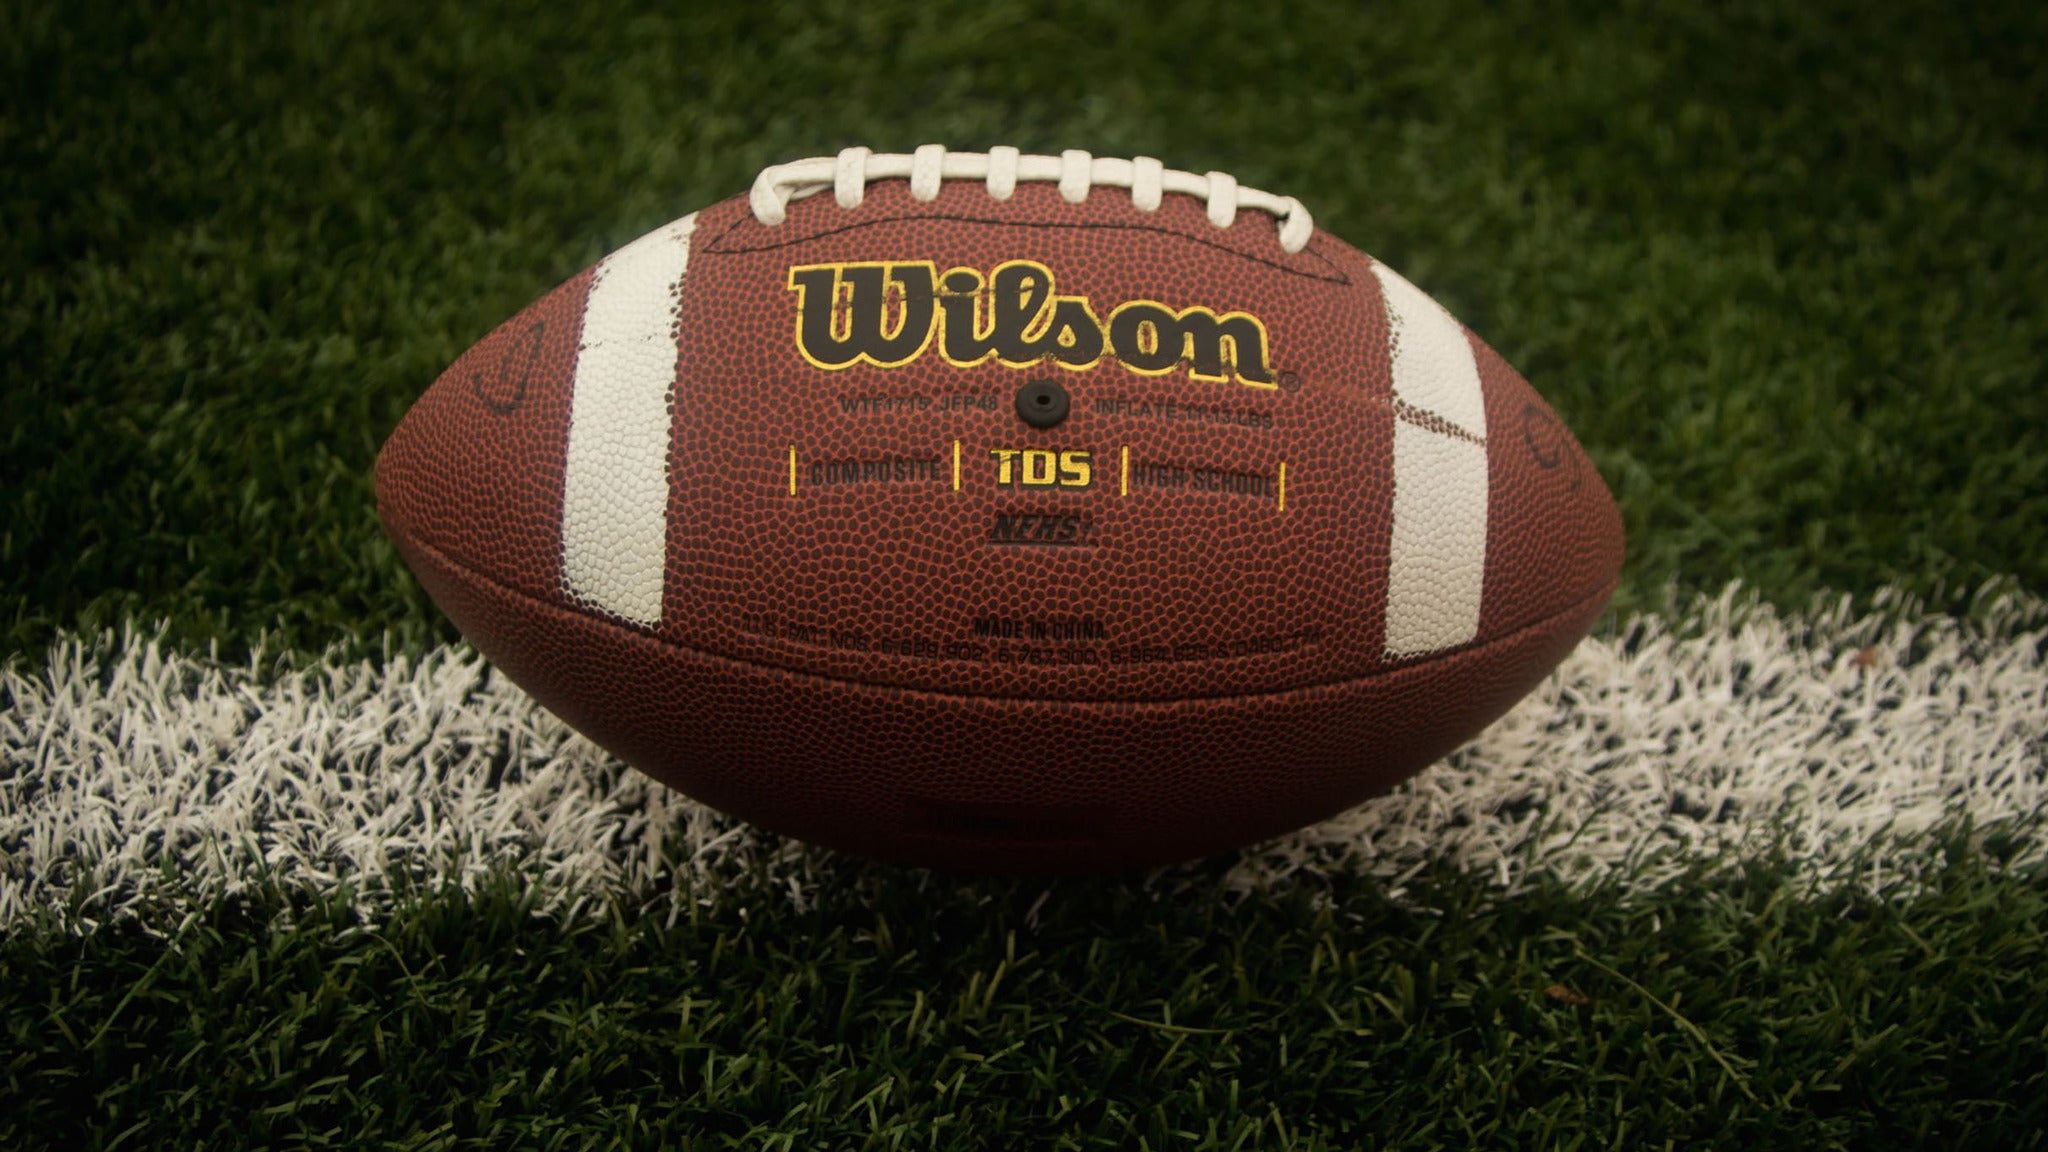 North Carolina Tar Heels Football vs. Appalachian State Mountaineers Football